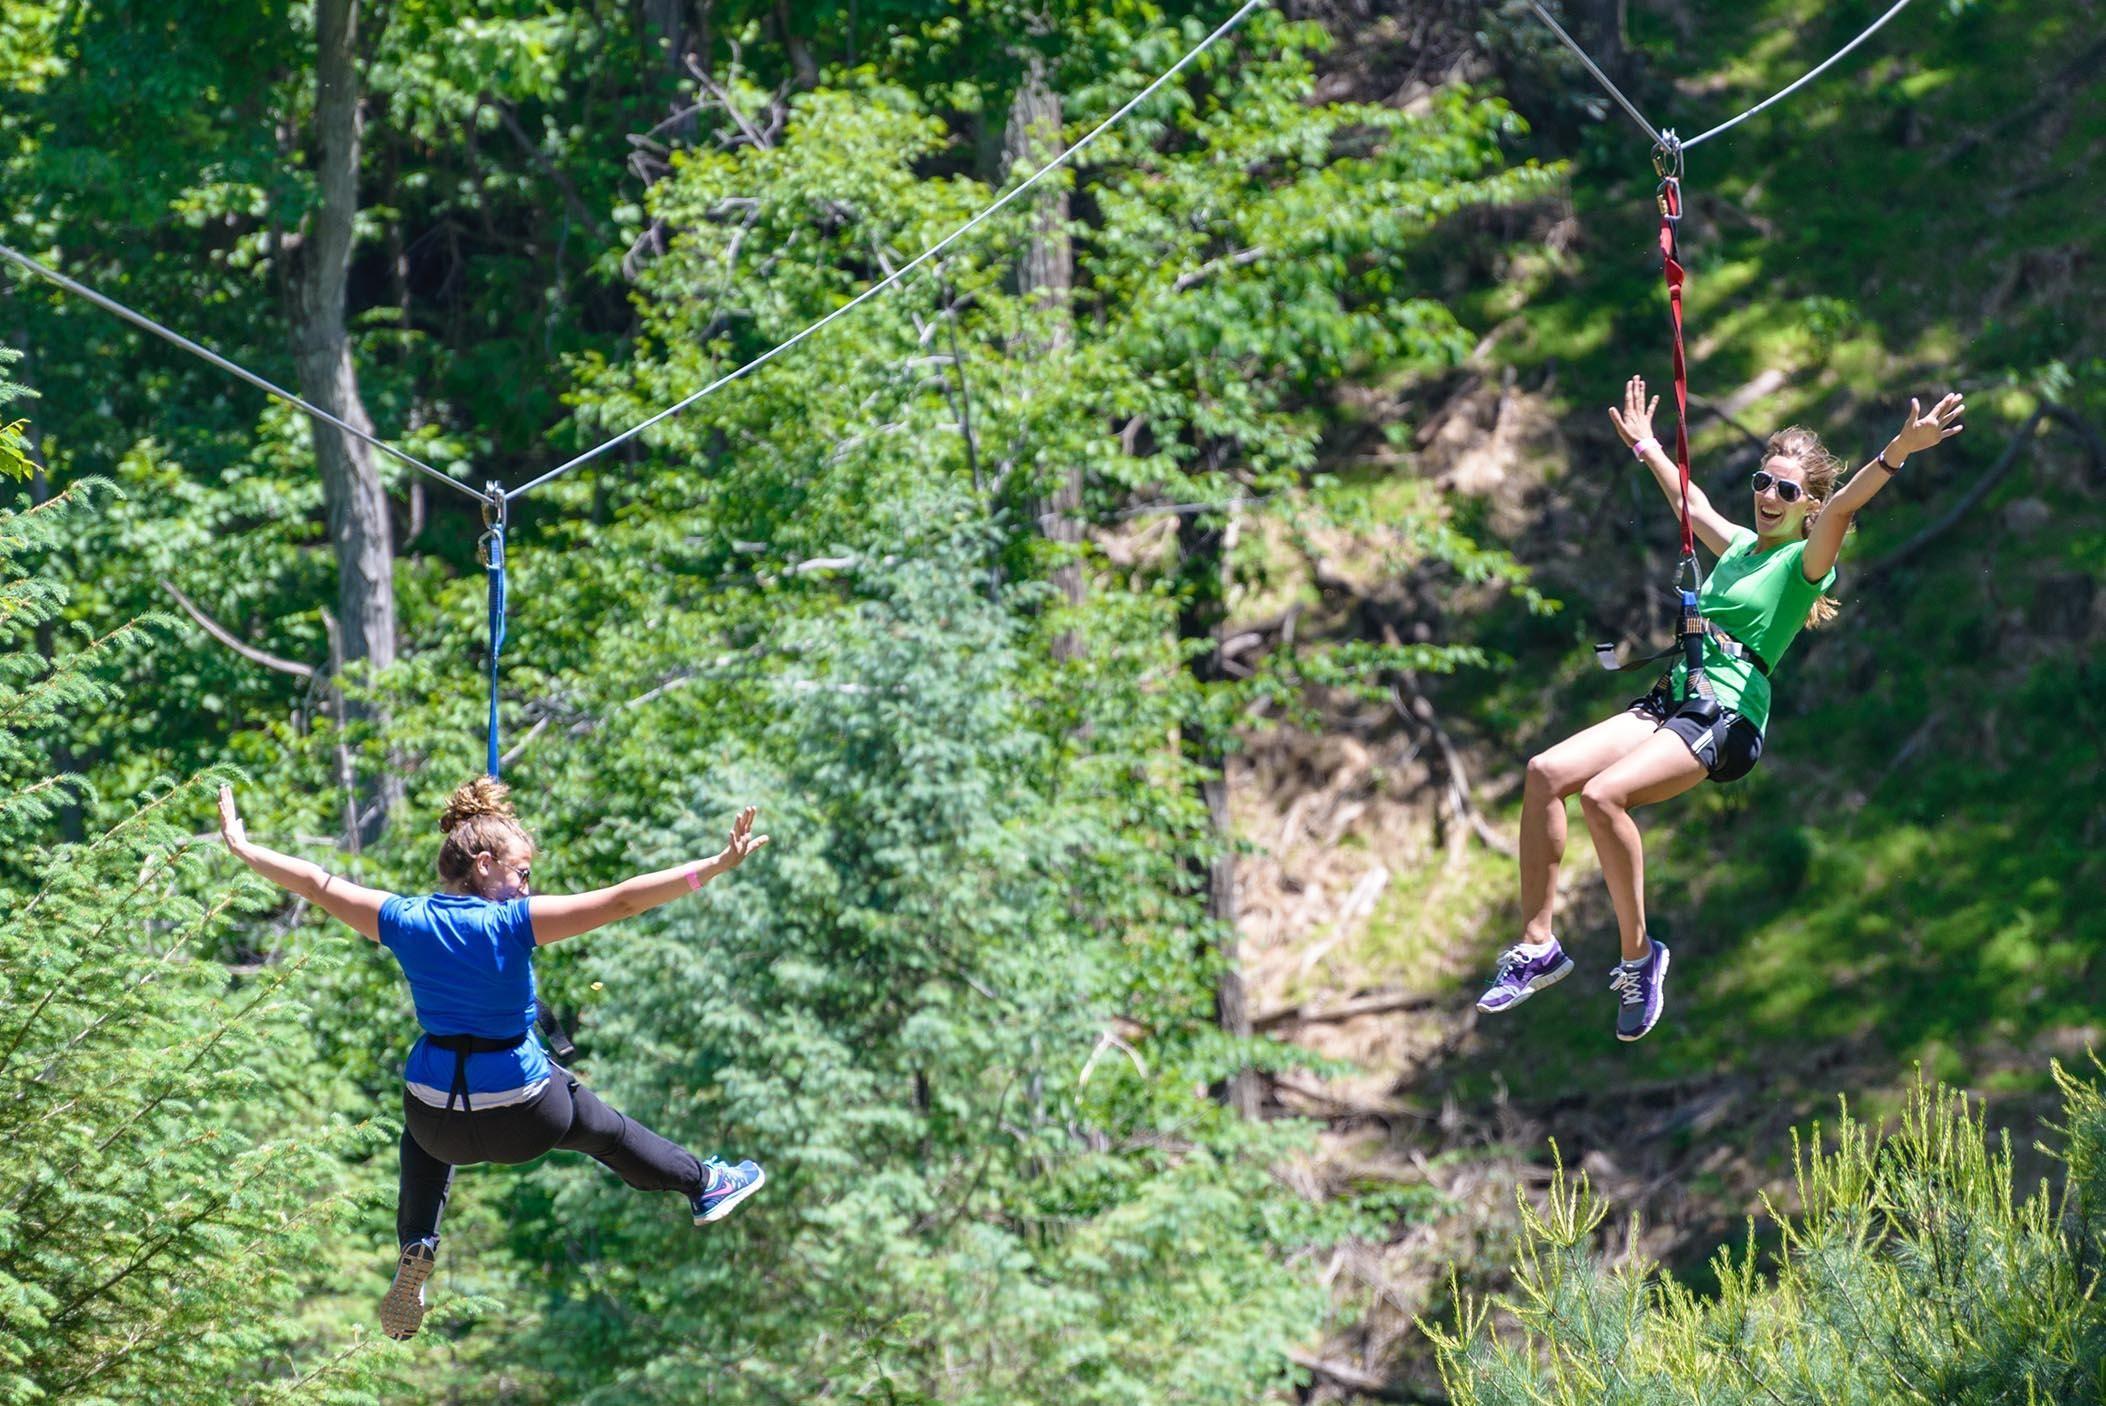 Zipline Poconos Soar Through The Sky On Our 1000 Dual Zip Lines Ziplining Poconos Poconos Pa